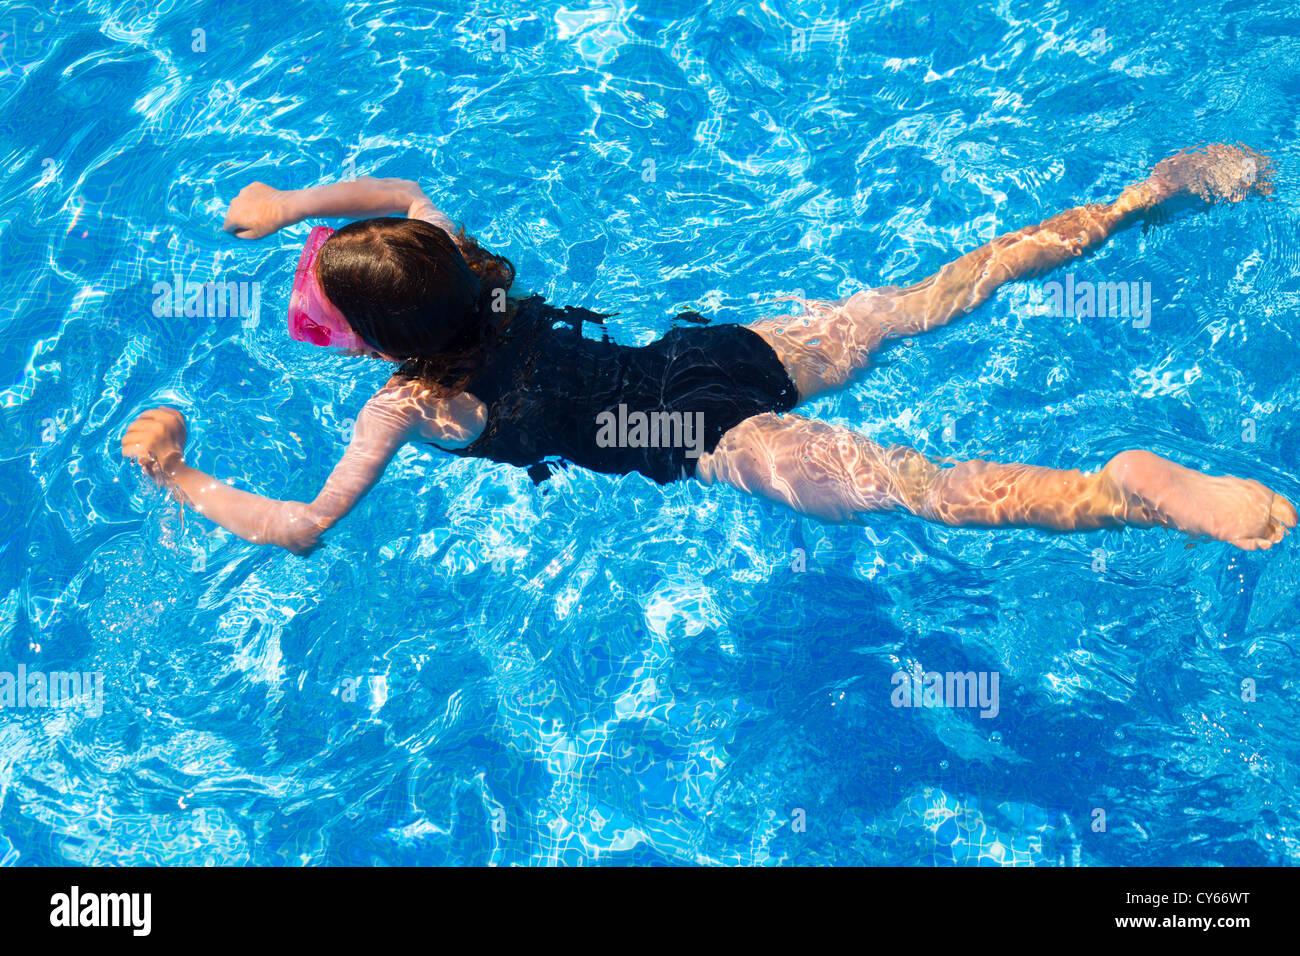 Girl Bikini Pool Vacation Travel Wet Young Resort Stock Photos Girl Bikini Pool Vacation